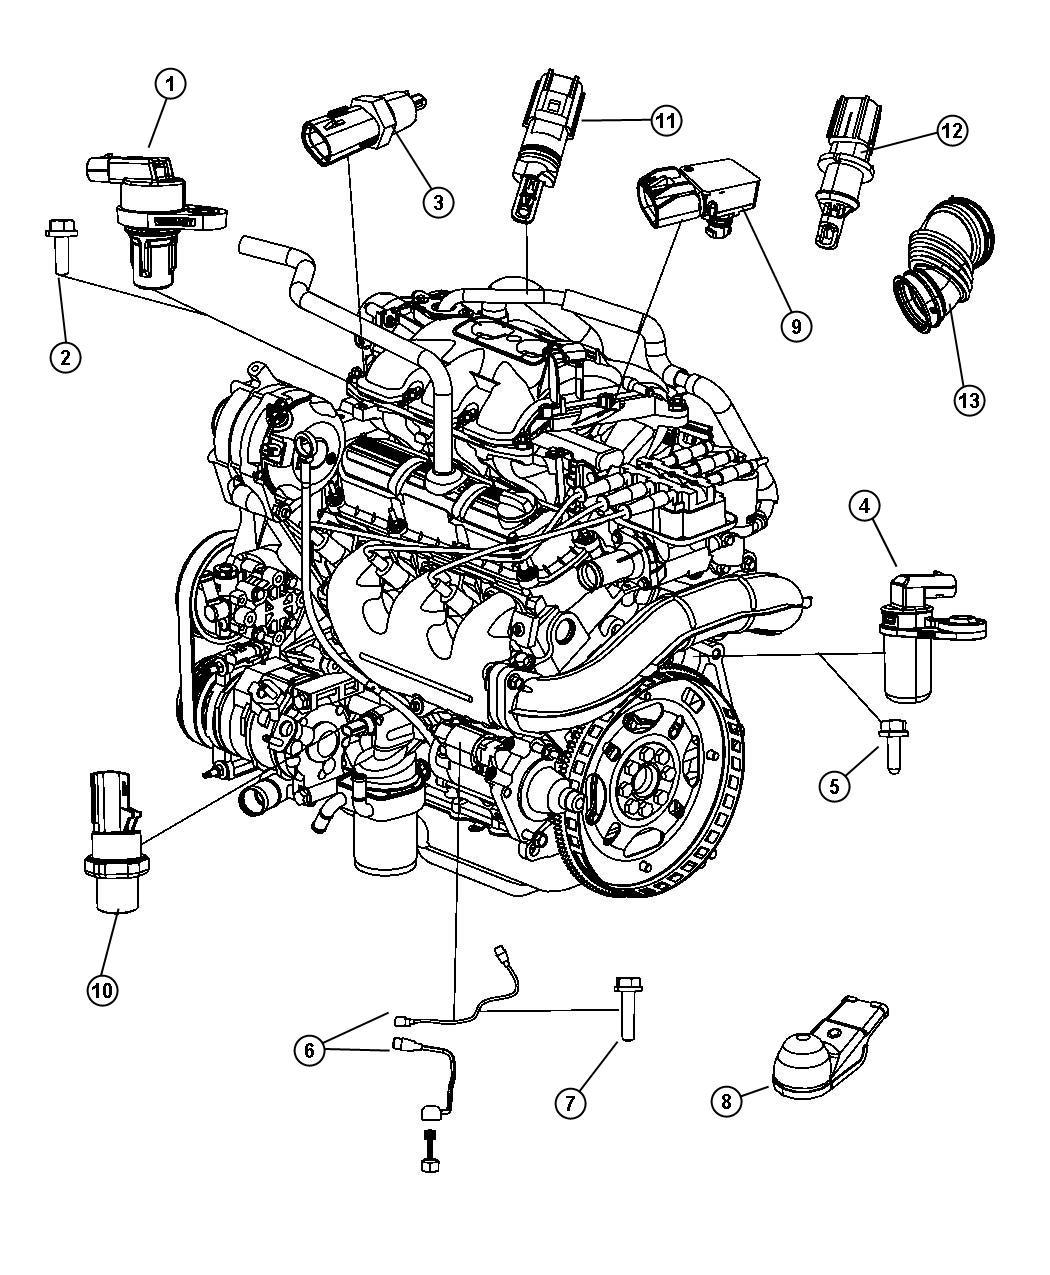 pt cruiser camshaft position sensor wiring diagram